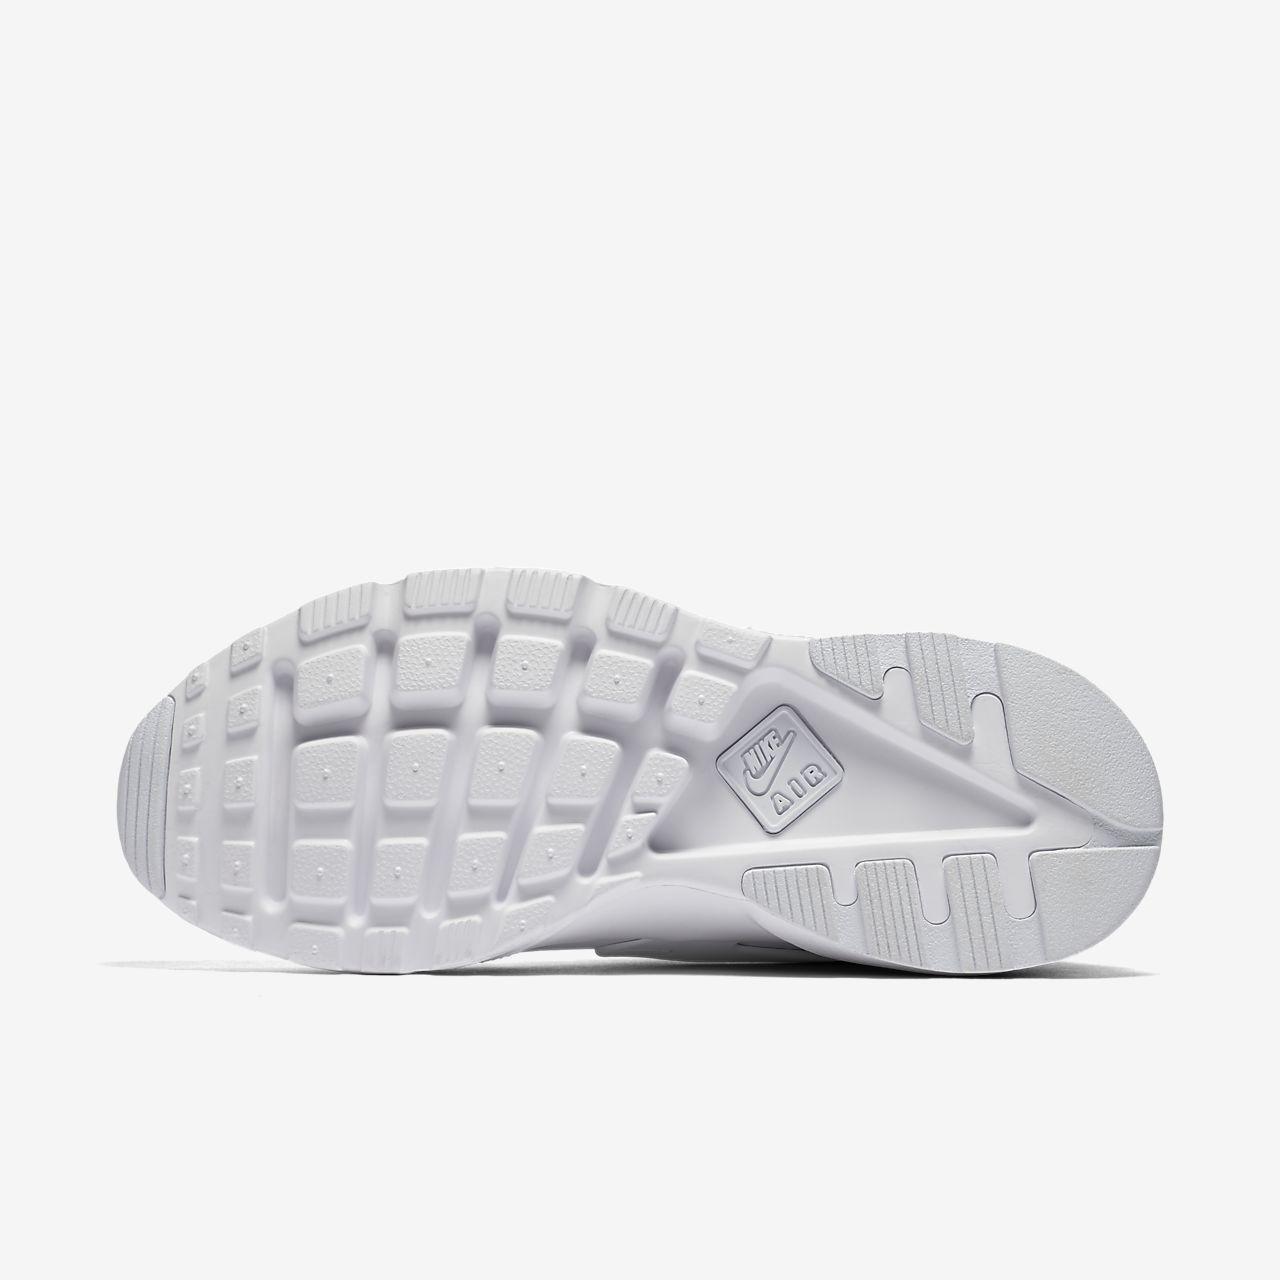 hot sale online 50834 0a8bd ... Scarpa Nike Air Huarache Ultra - Uomo